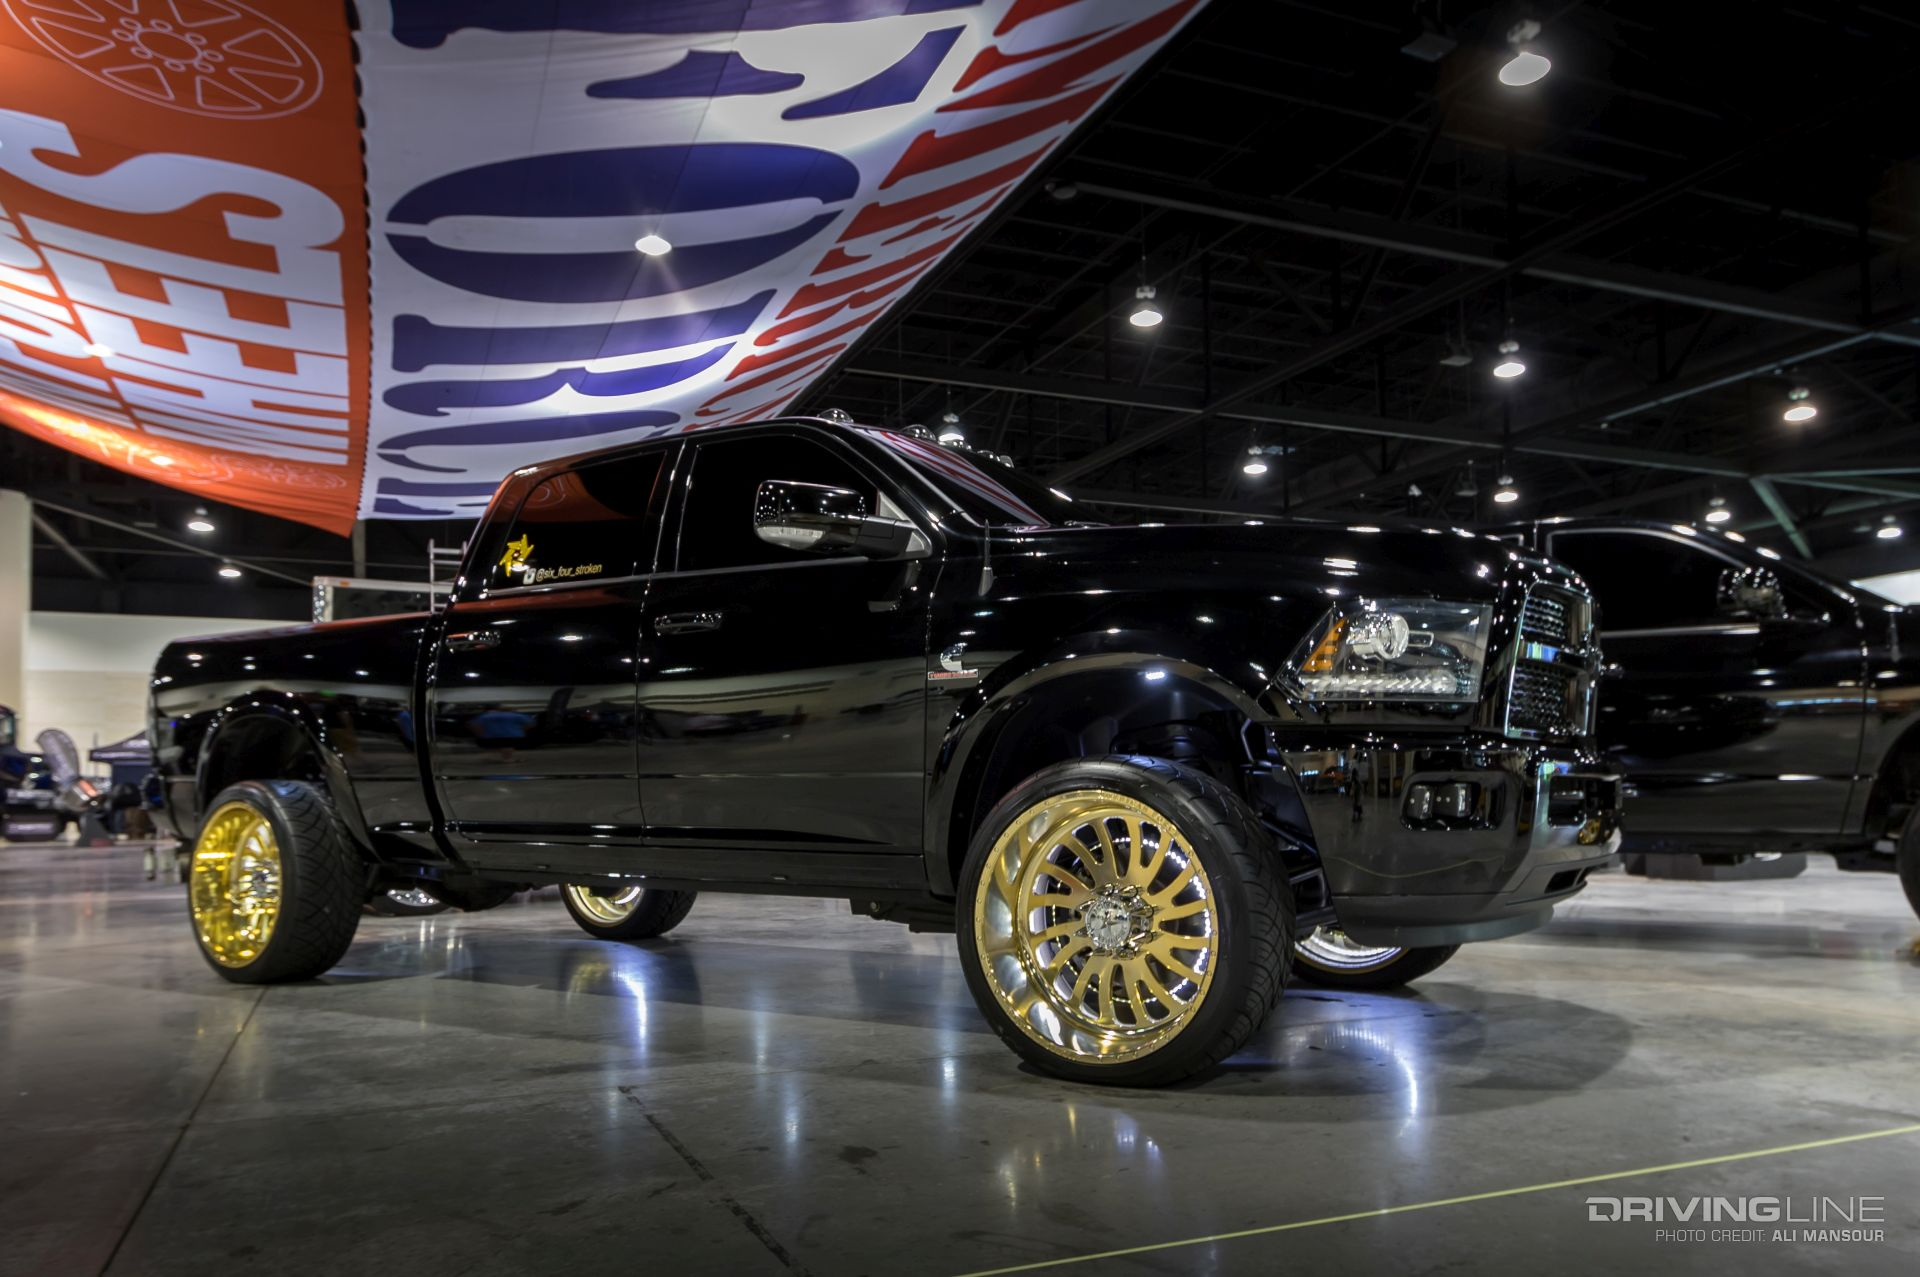 Jeep Beach Daytona 2017 >> Battle of the Bling: The 2017 Daytona Truck Meet | DrivingLine